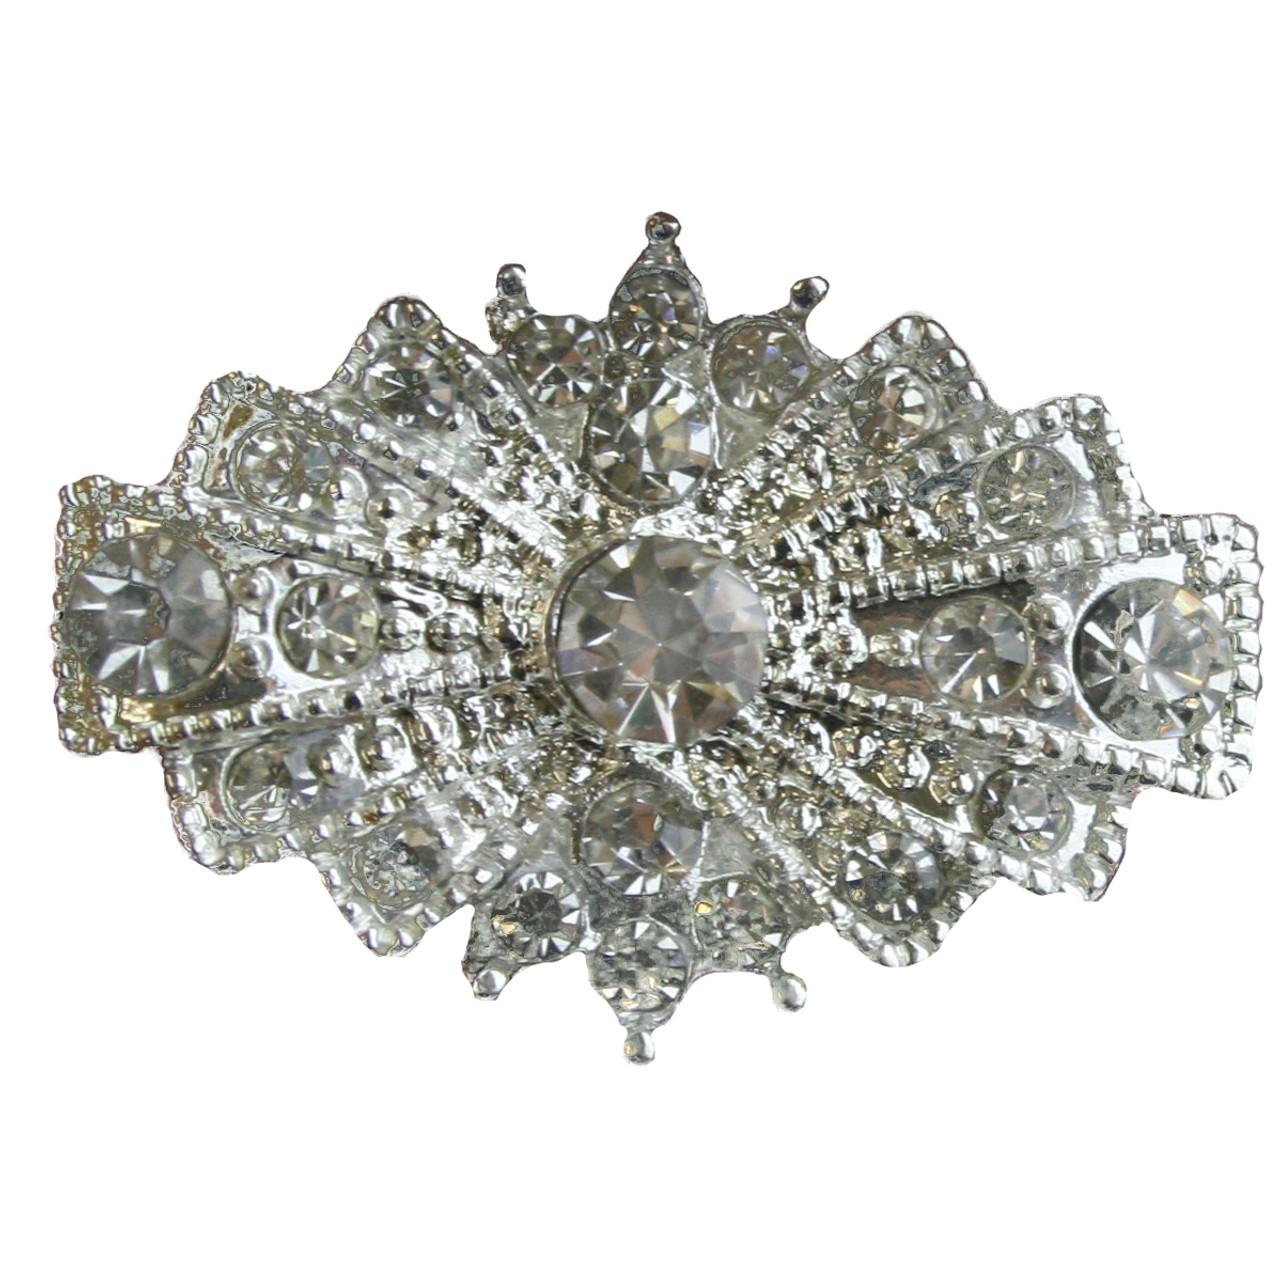 3705ee908c1 3 pcs ART DECO Flatback Style Rhinestone Embellishment Vintage Wedding  Bridal Accessories Invitations Crystal Bouquet Hair Clip Jewelry Button  Brooch ...